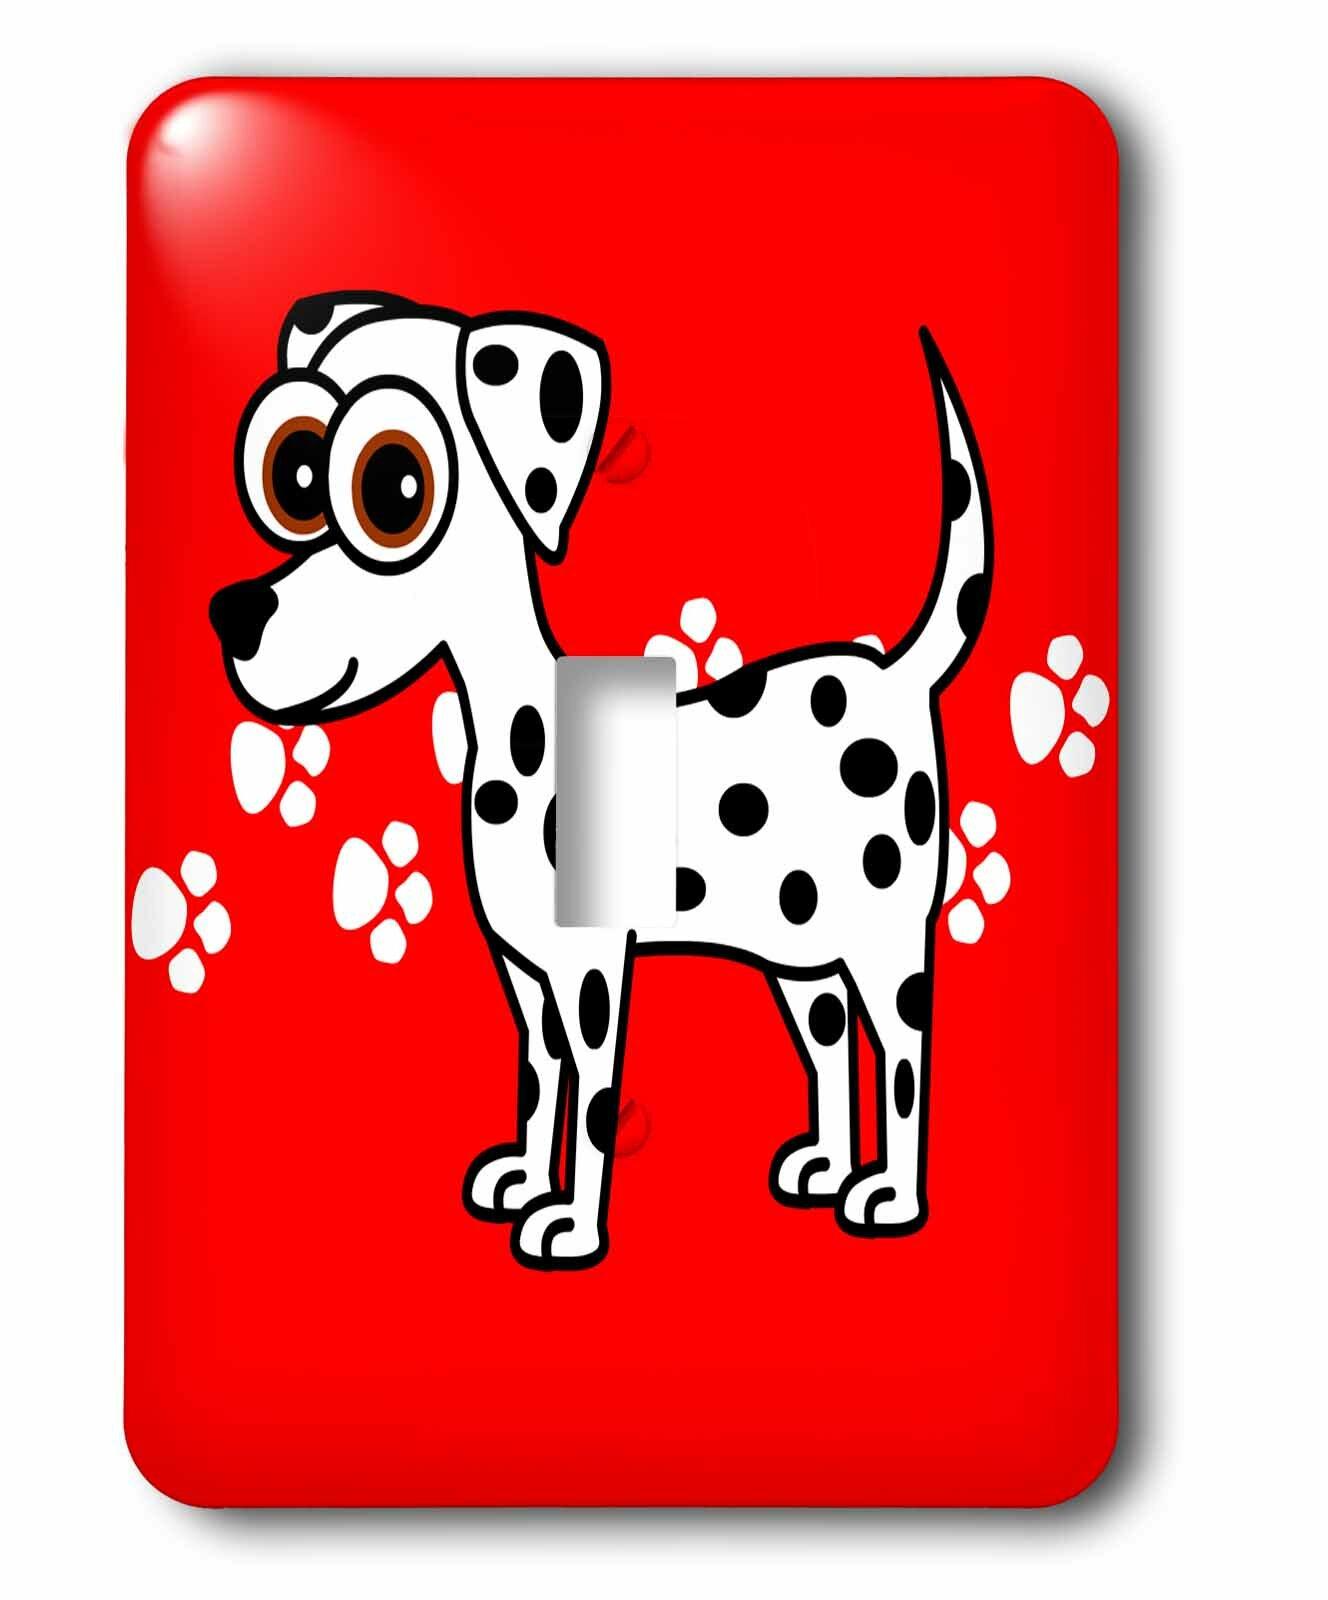 3drose Dalmatian And Paw Prints 1 Gang Toggle Light Switch Wall Plate Wayfair